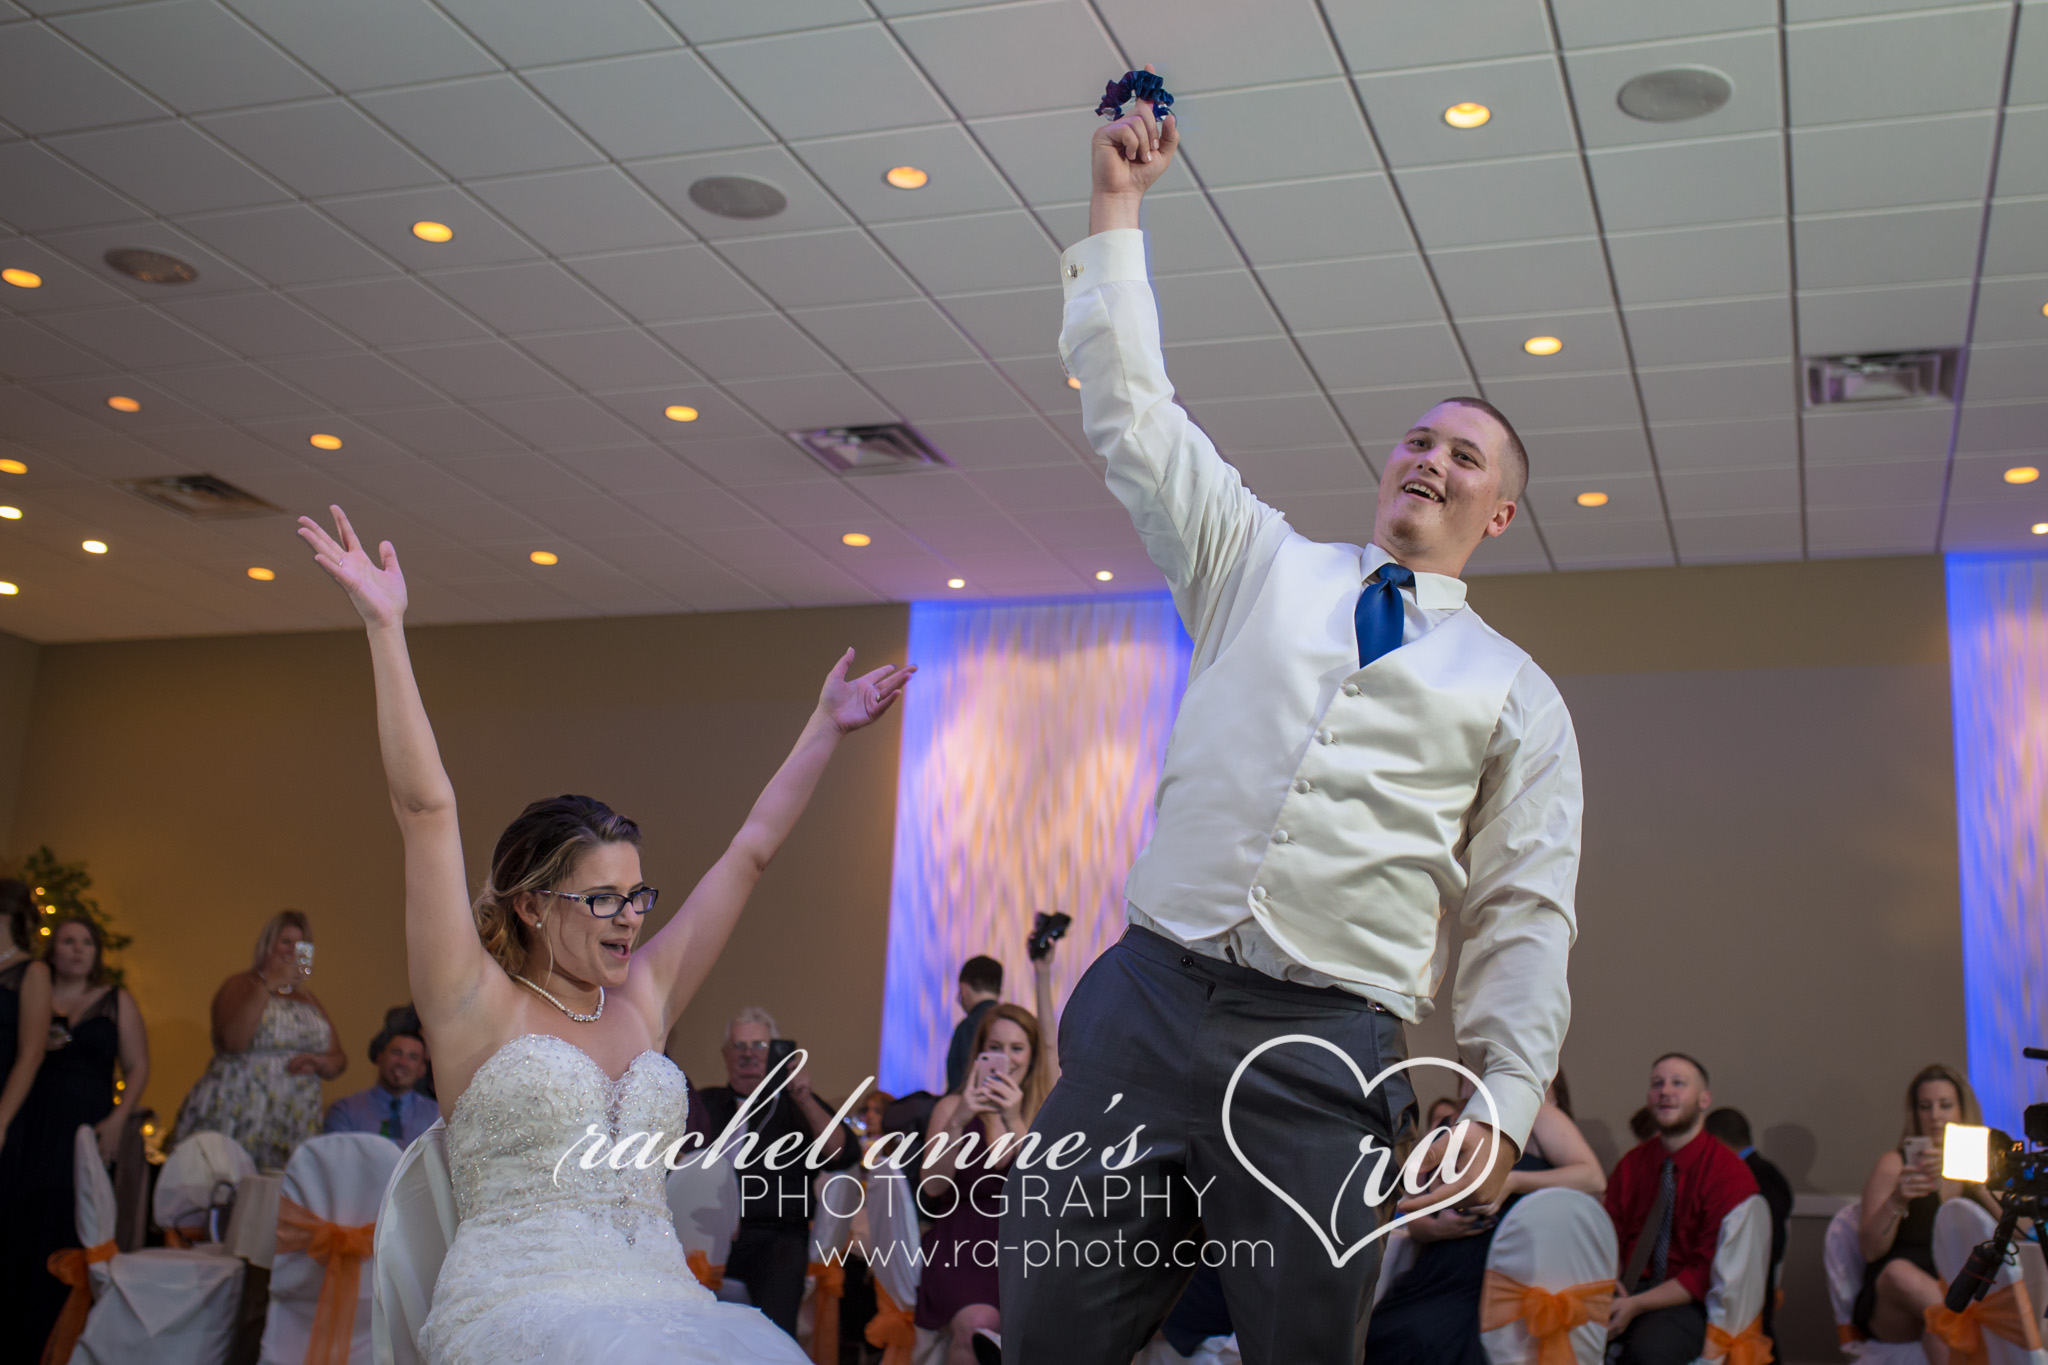 081-JCM-OLD-ECONOMY-VILLAGE-THE-FEZ-PA-WEDDINGS.jpg